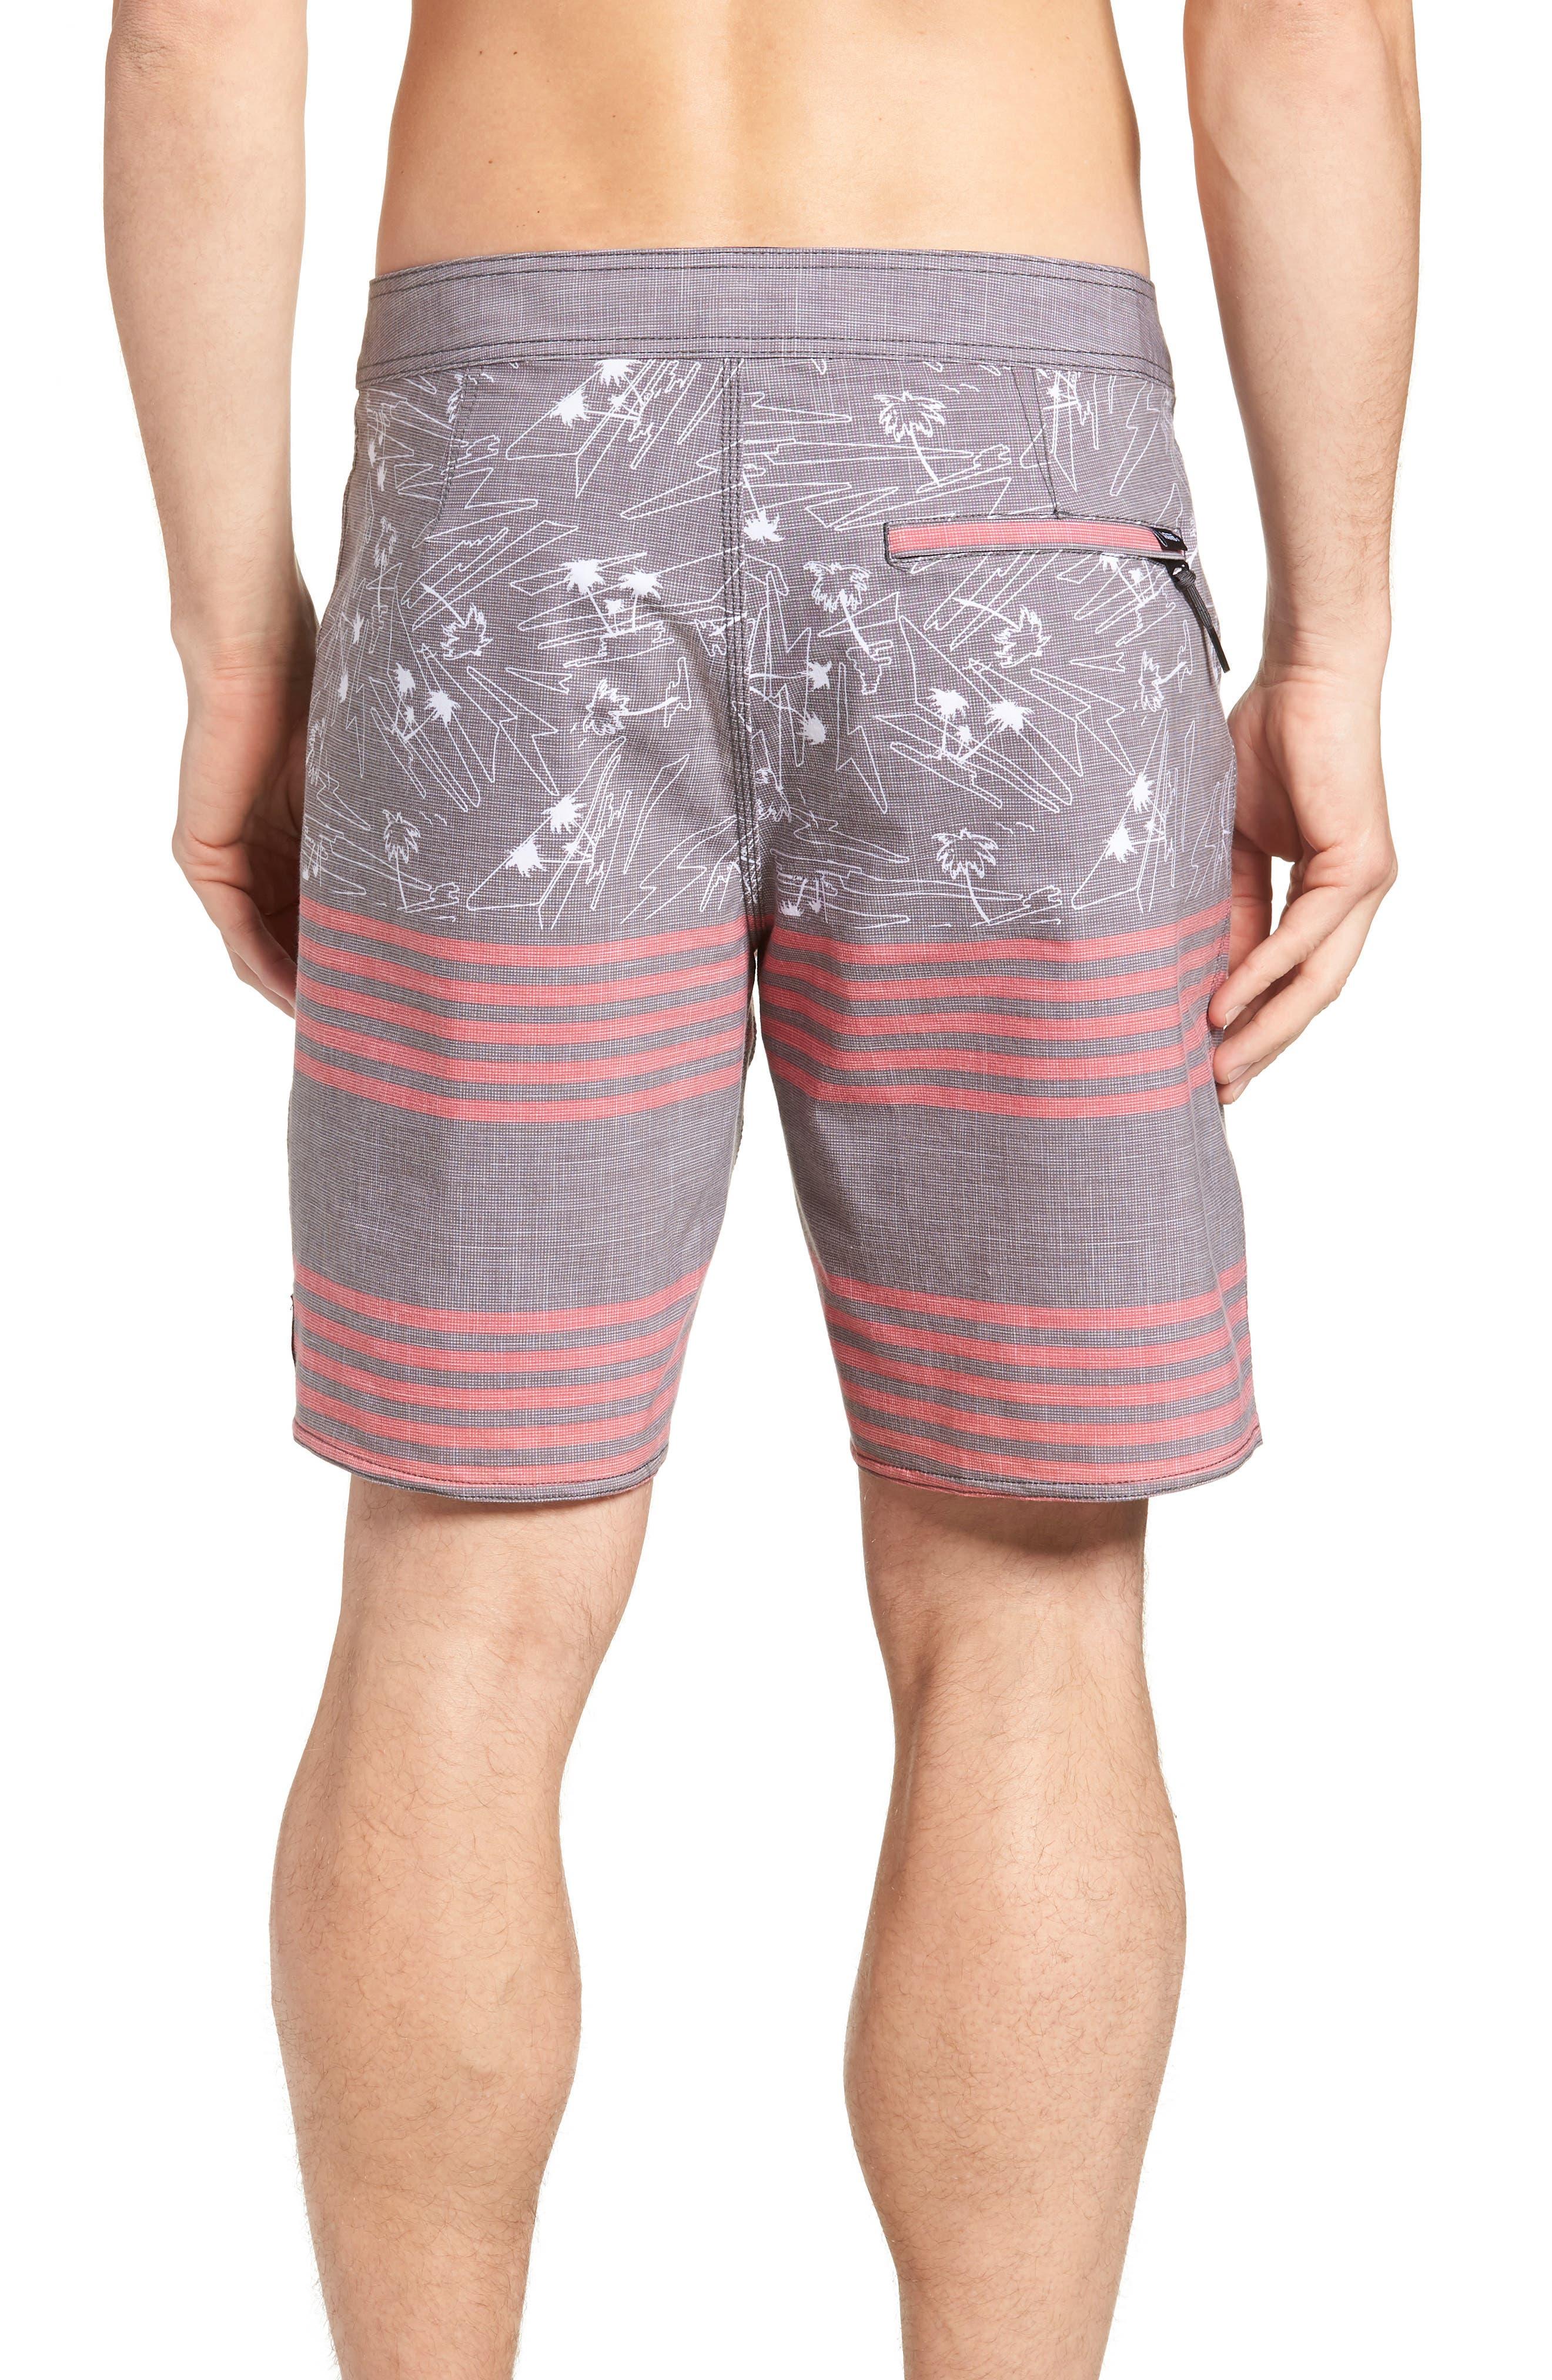 Era Board Shorts,                             Alternate thumbnail 2, color,                             BLACK ISLAND BEACH